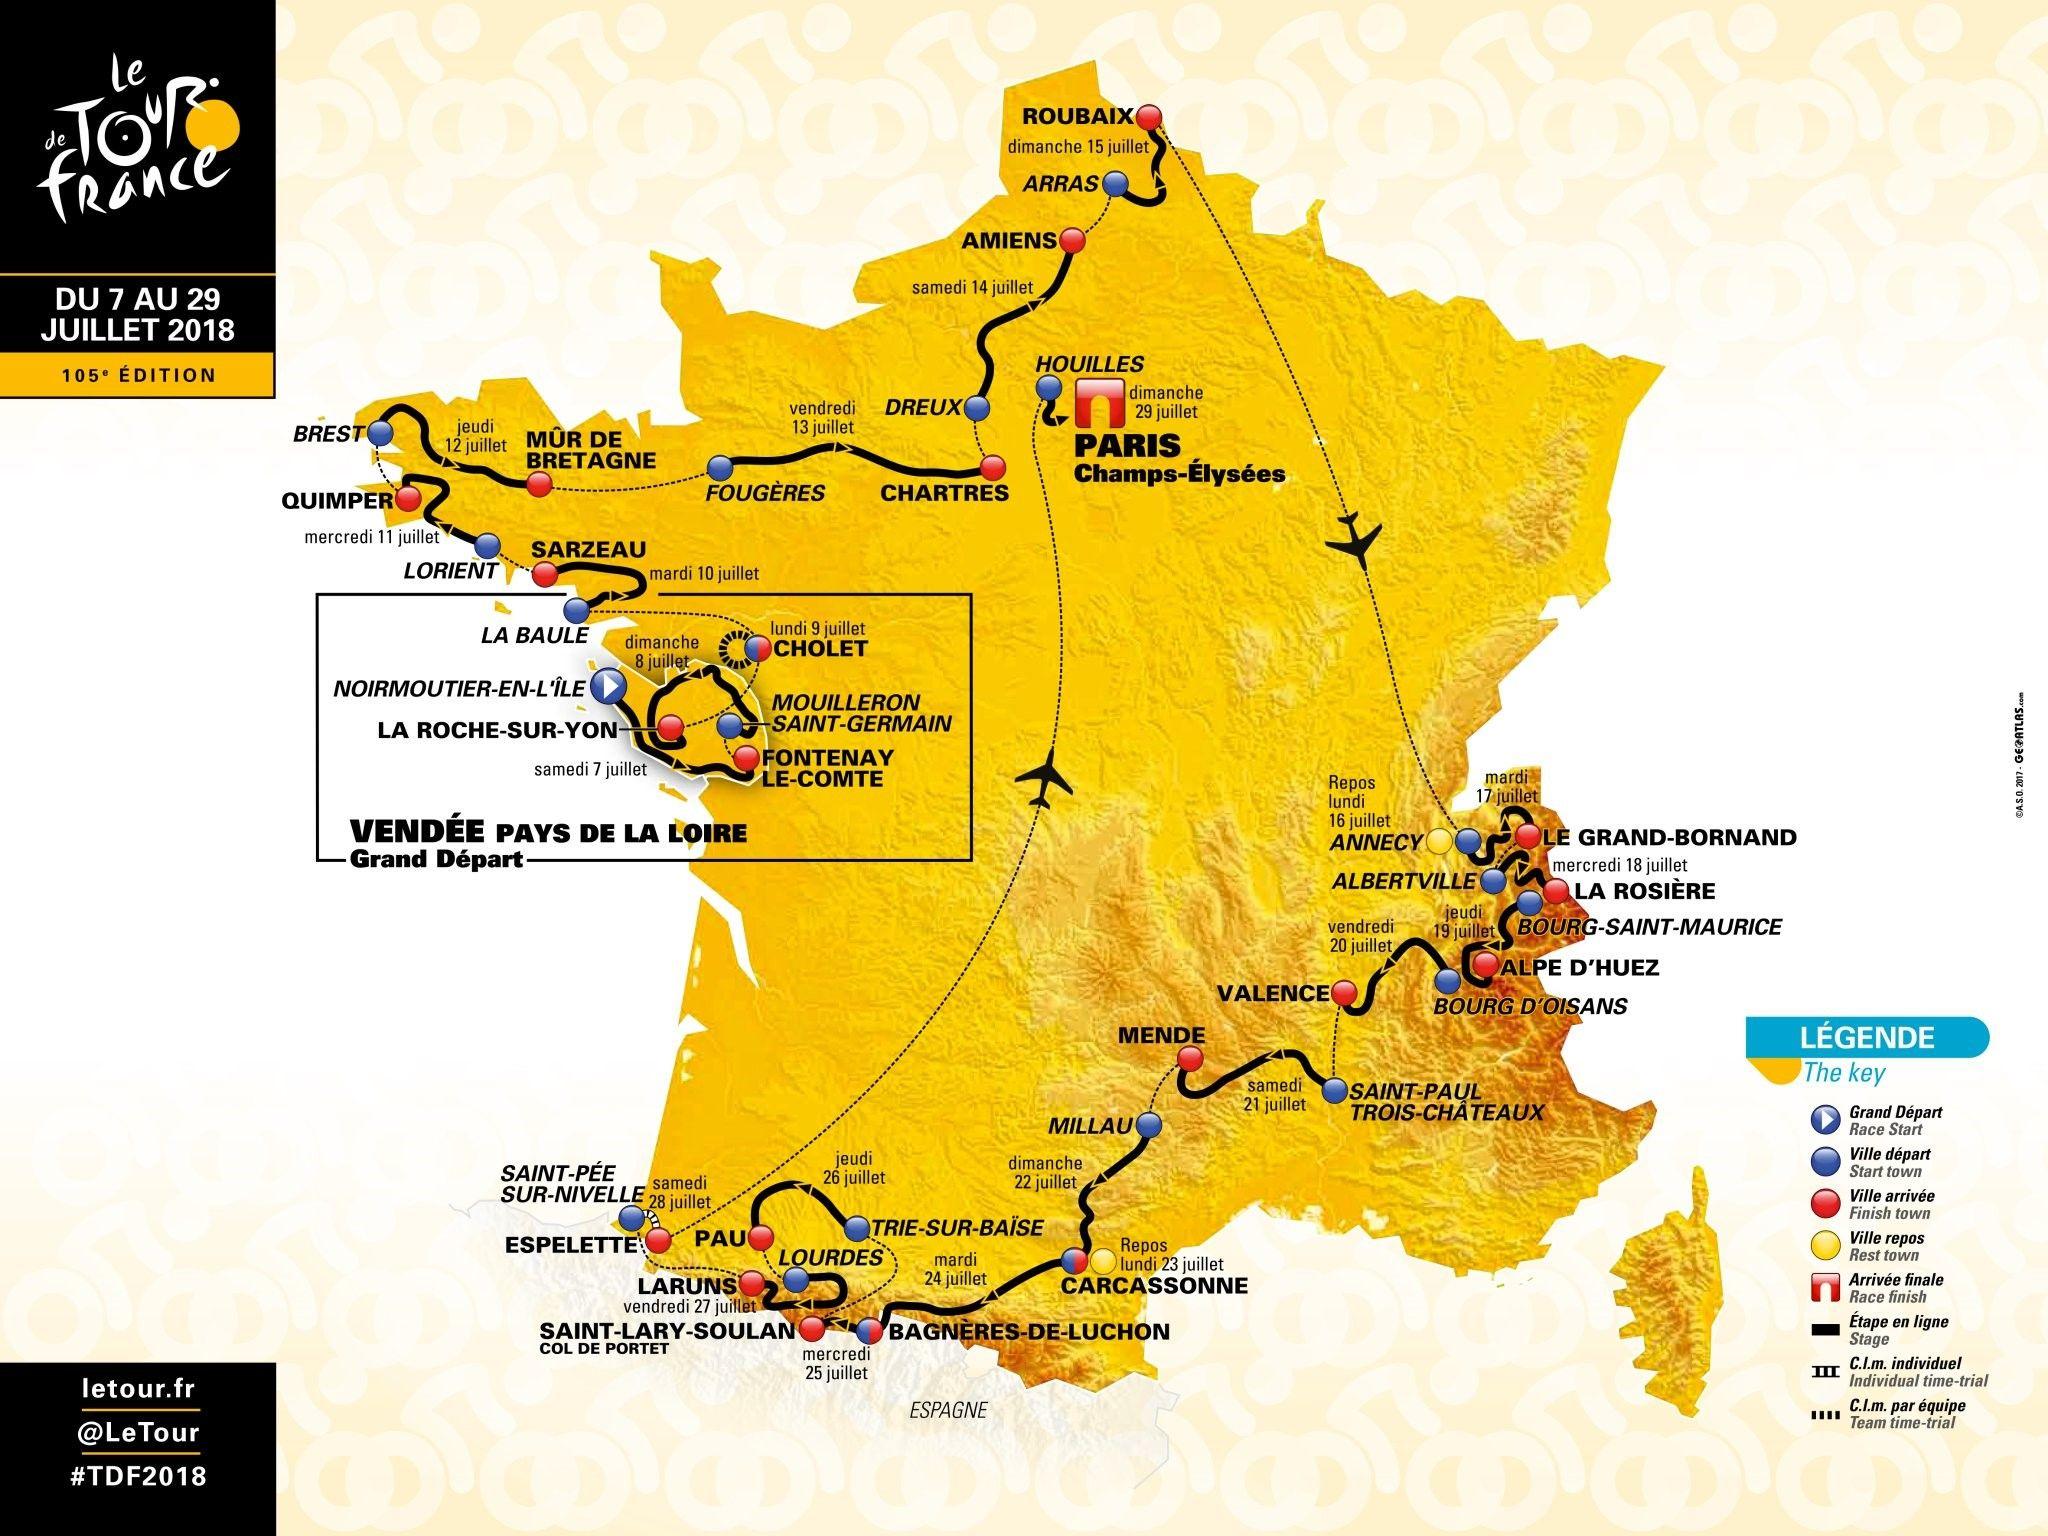 Tour De France 2018 Rotası Açıklandı - Fransa Bisiklet Turu serapportantà Image De La Carte De France